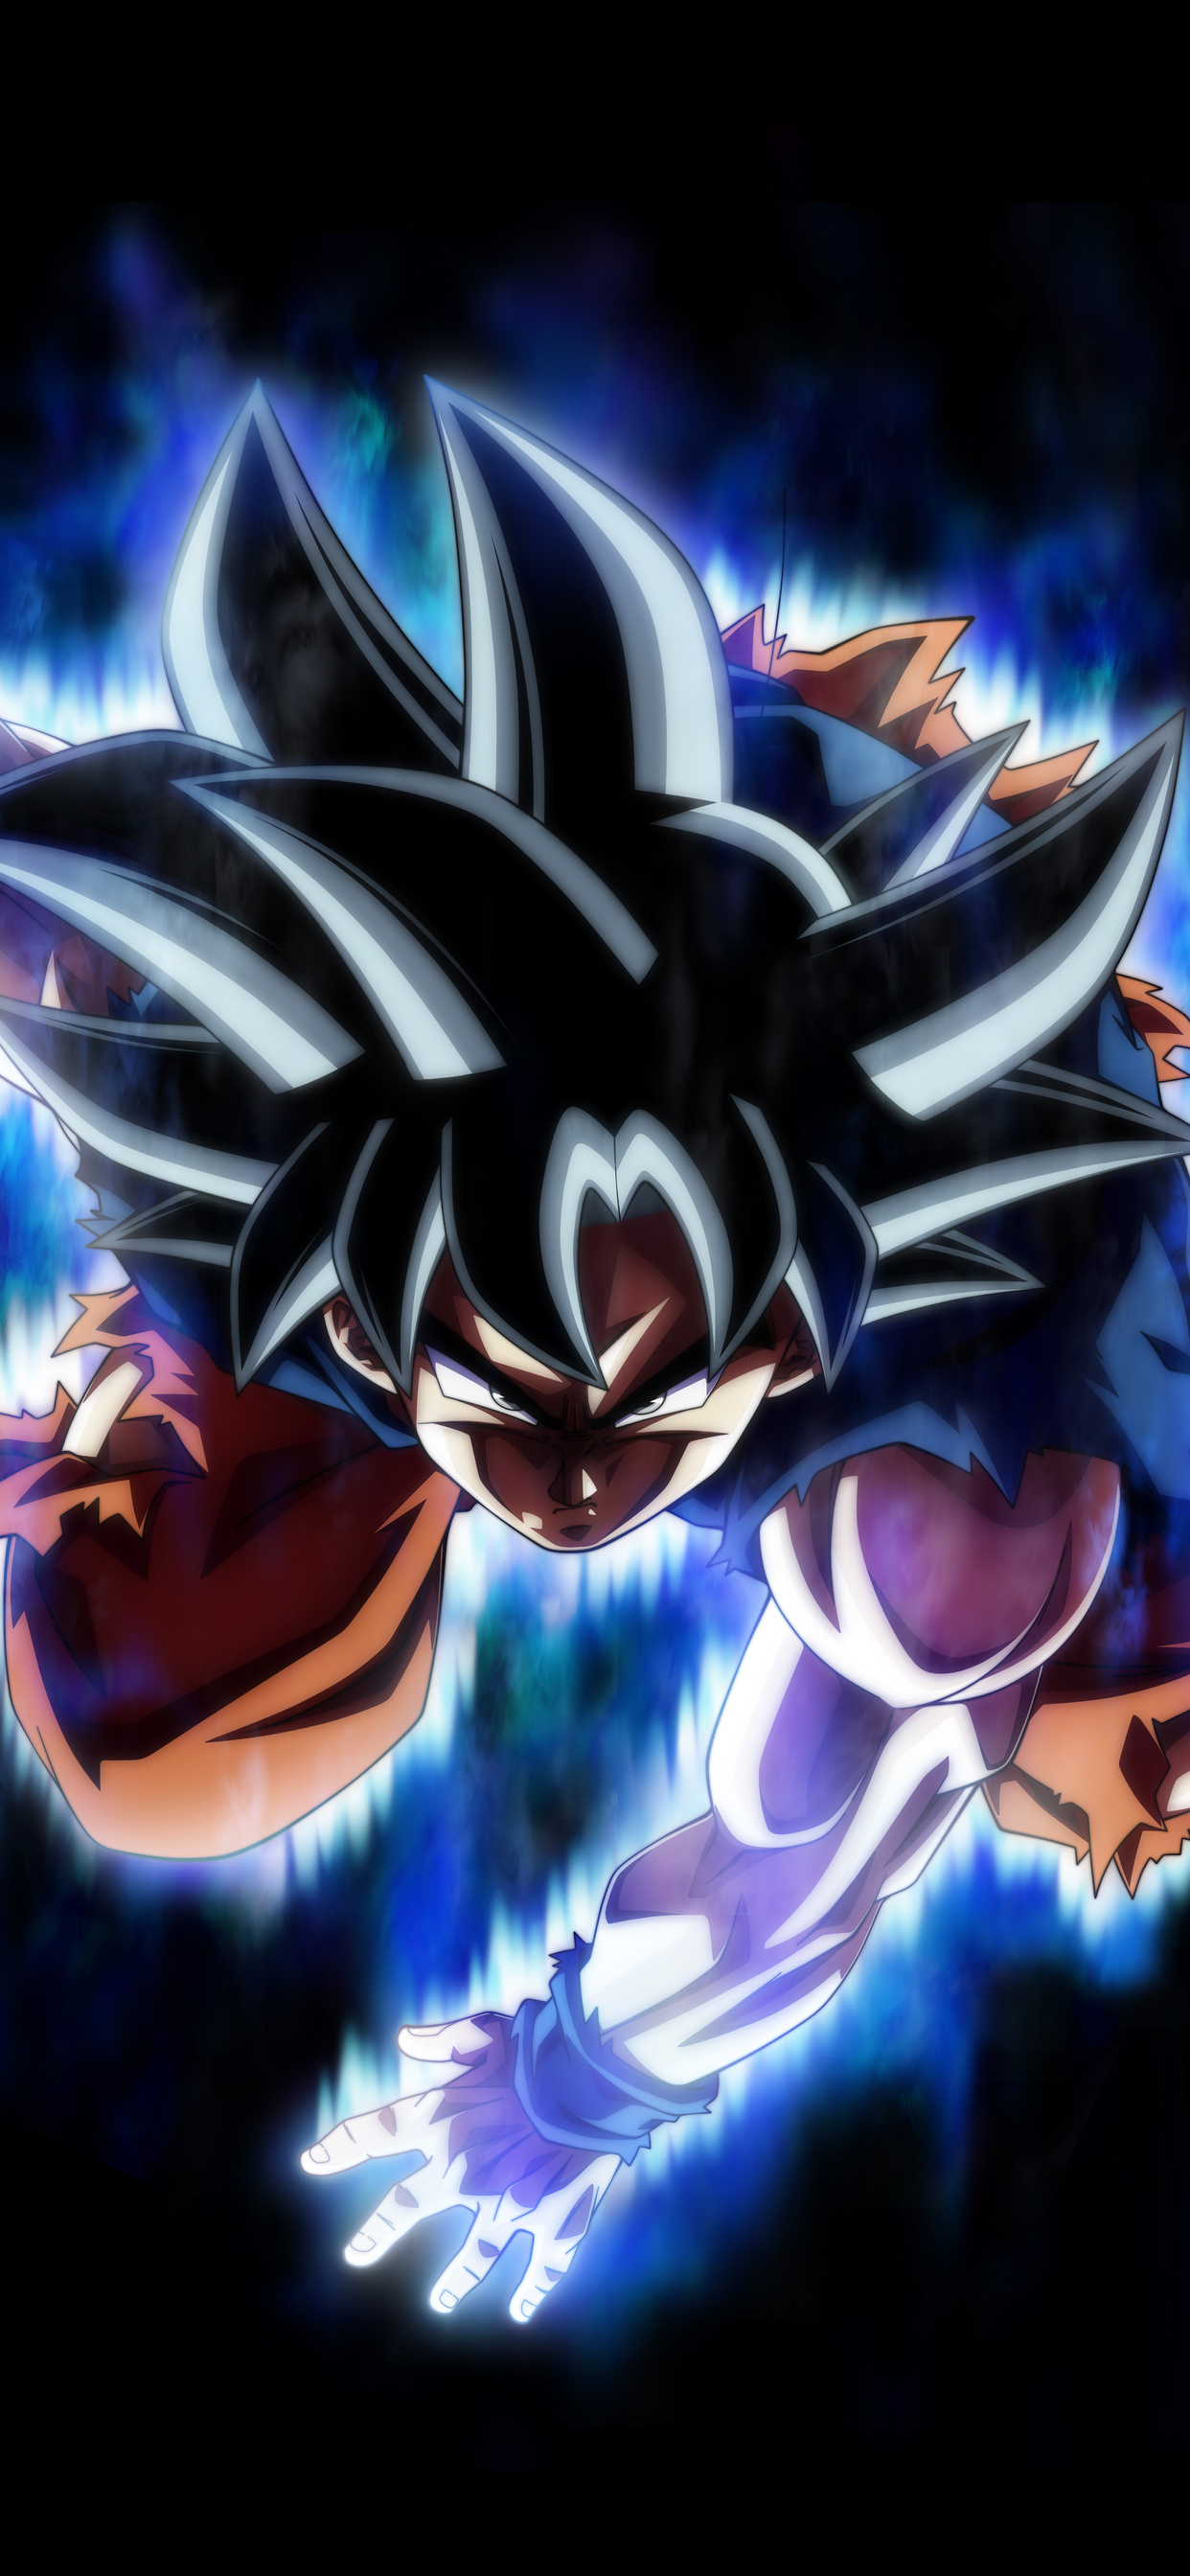 Dragon Ball Z Iphone Xs Max Wallpaper | kadada org